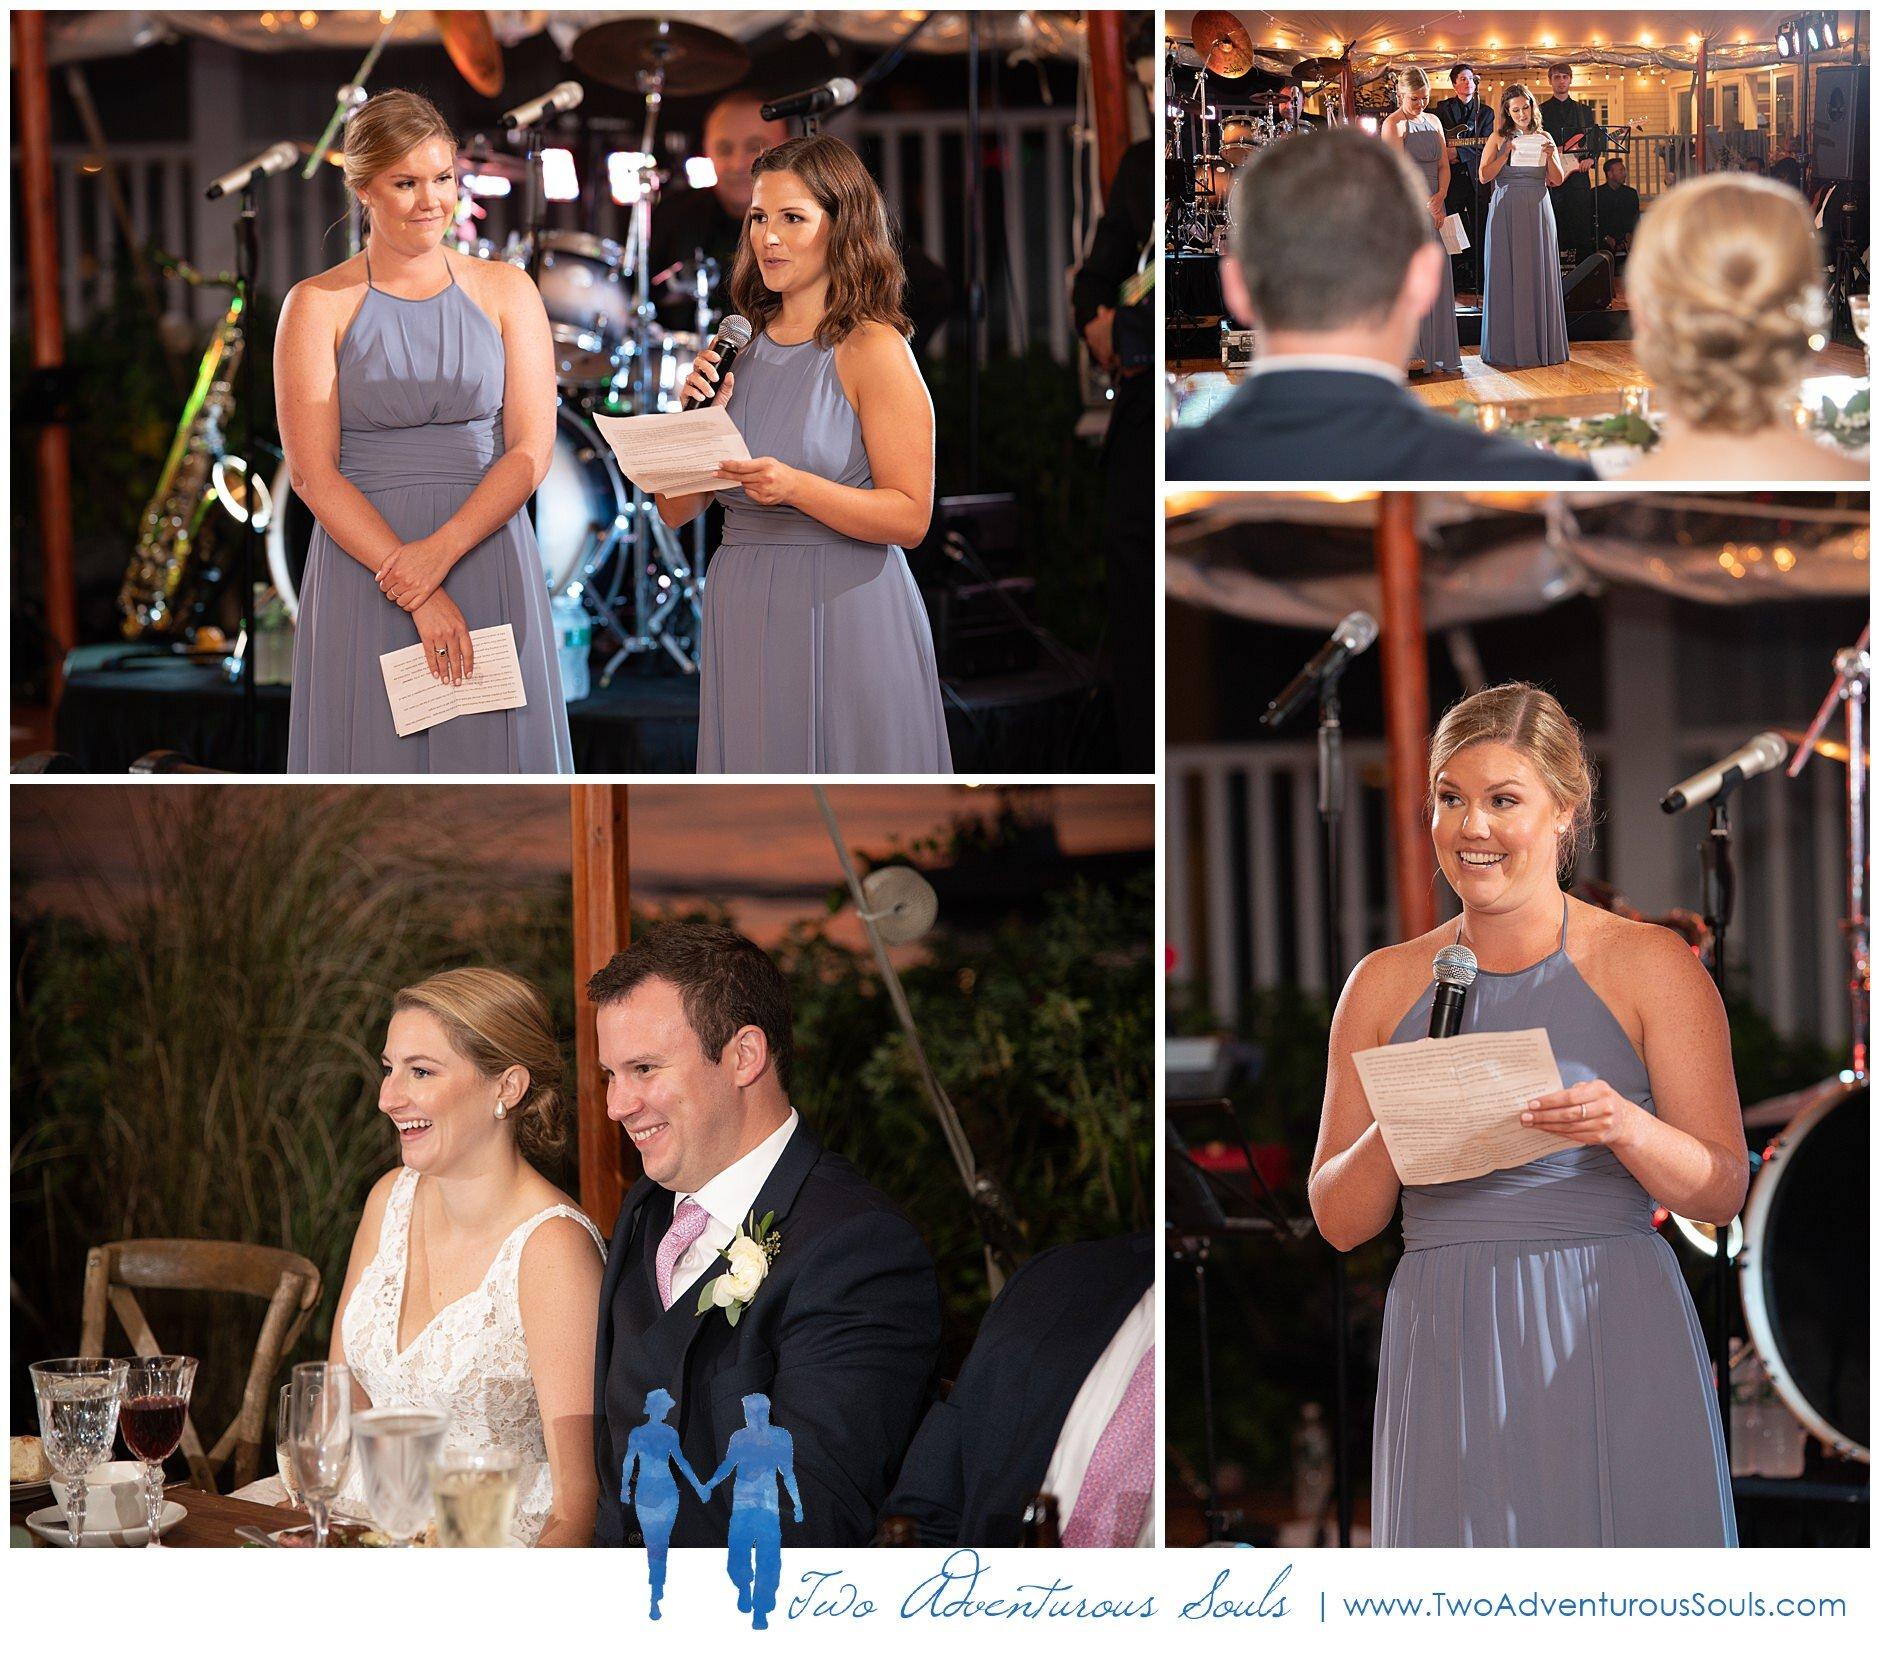 Breakwater Inn and Spa Wedding Photographers, Kennebunkport Wedding Photographers, Two Adventurous Souls- 092119_0057.jpg